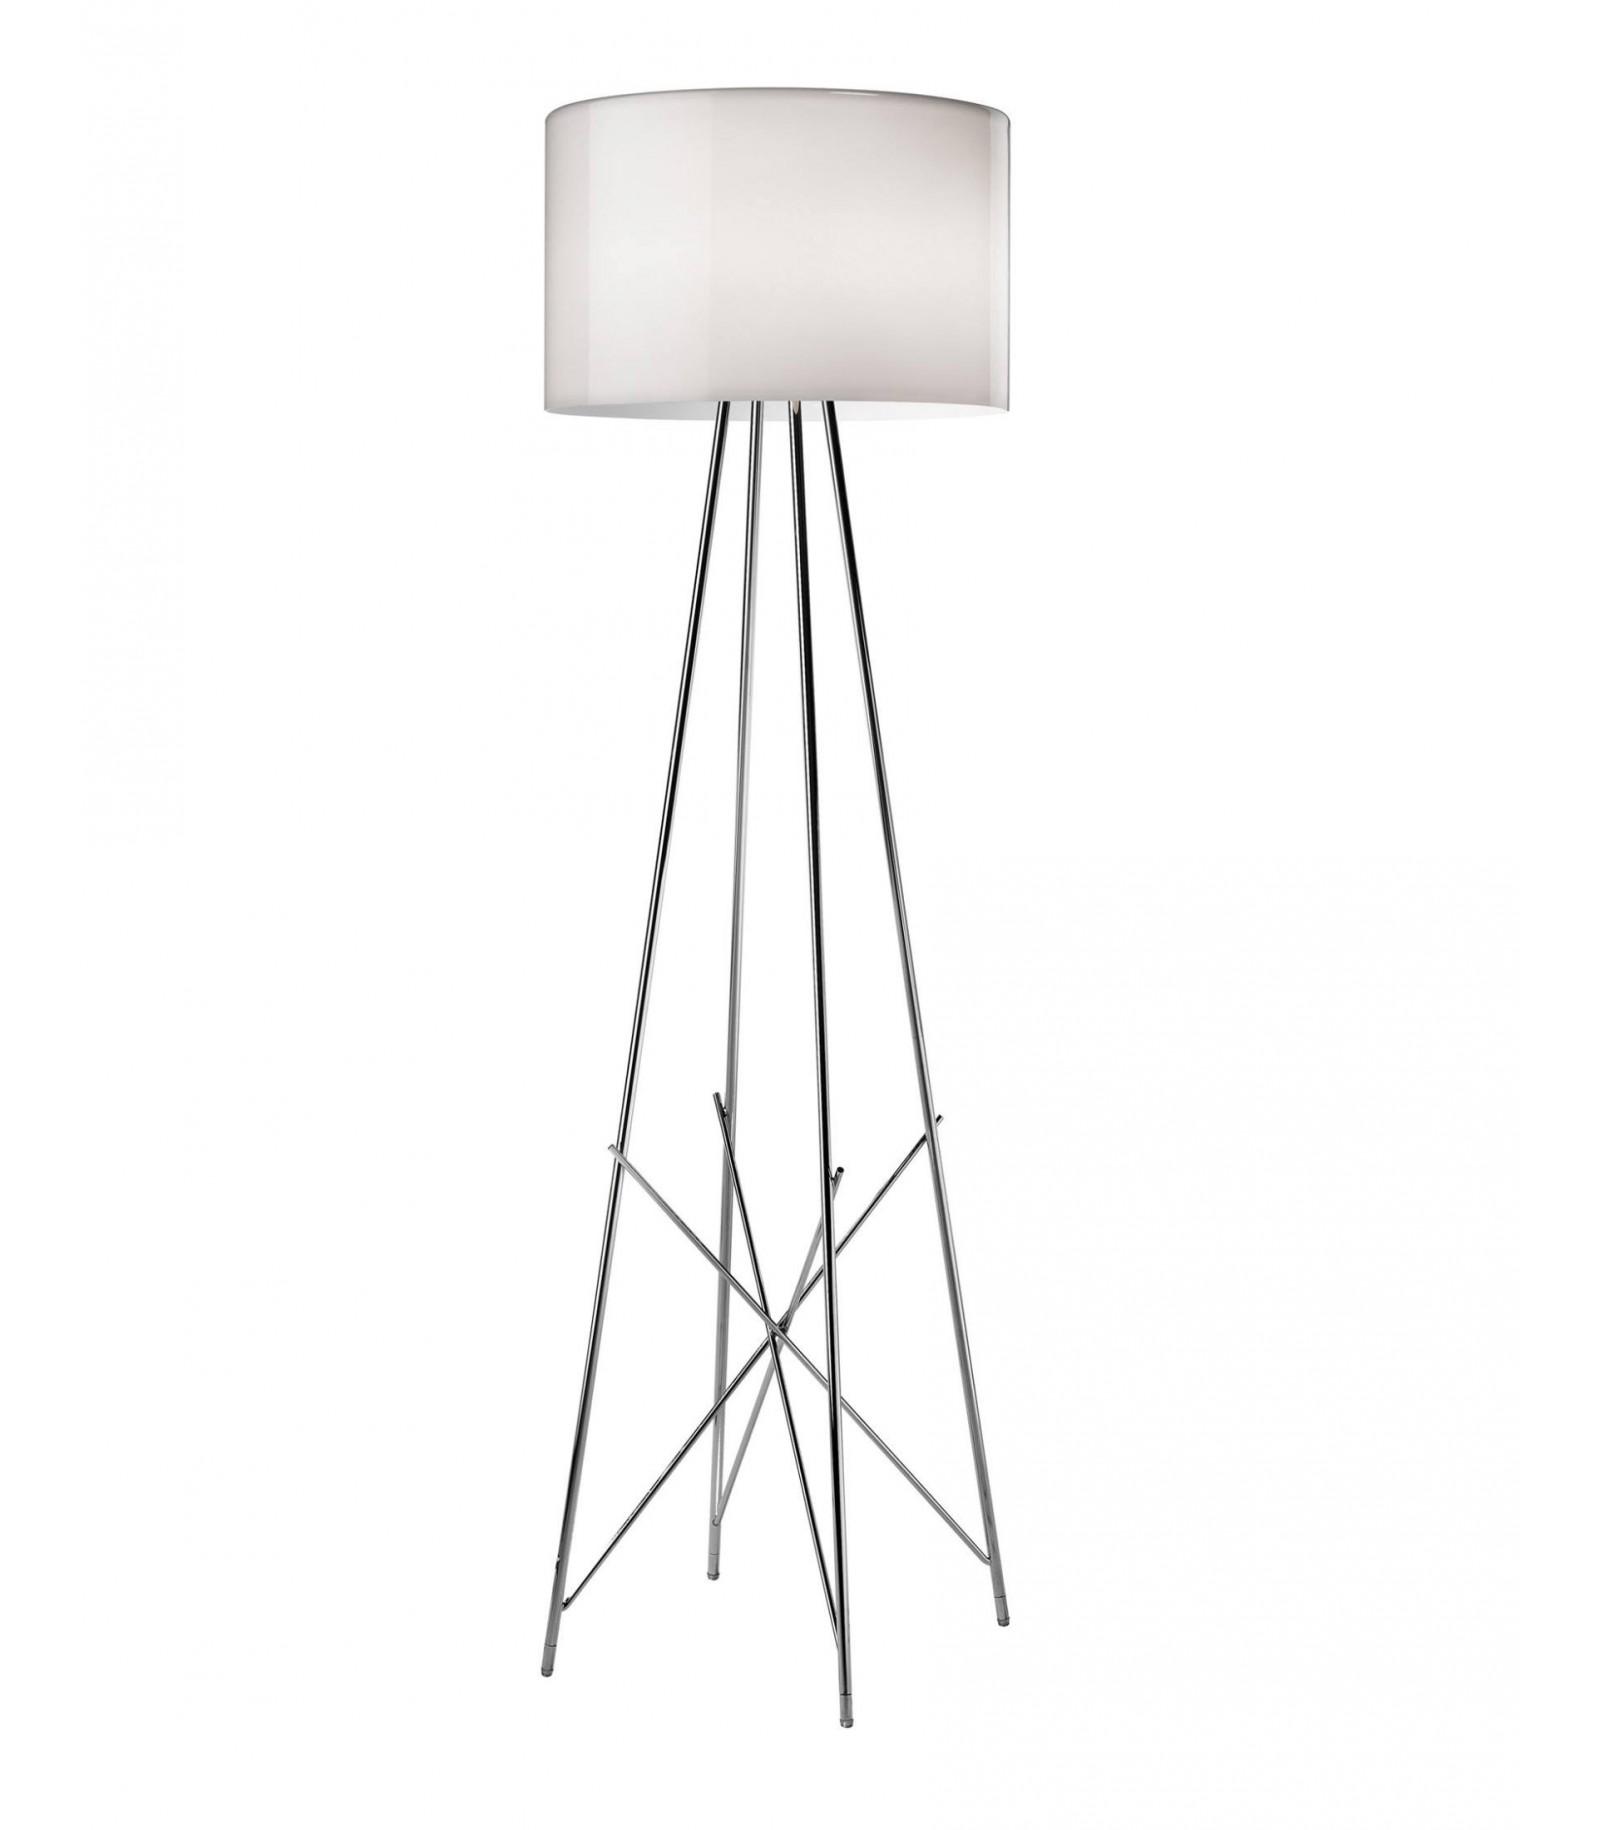 Lampada da terra ray f1 di flos - Lampade da terra design outlet ...